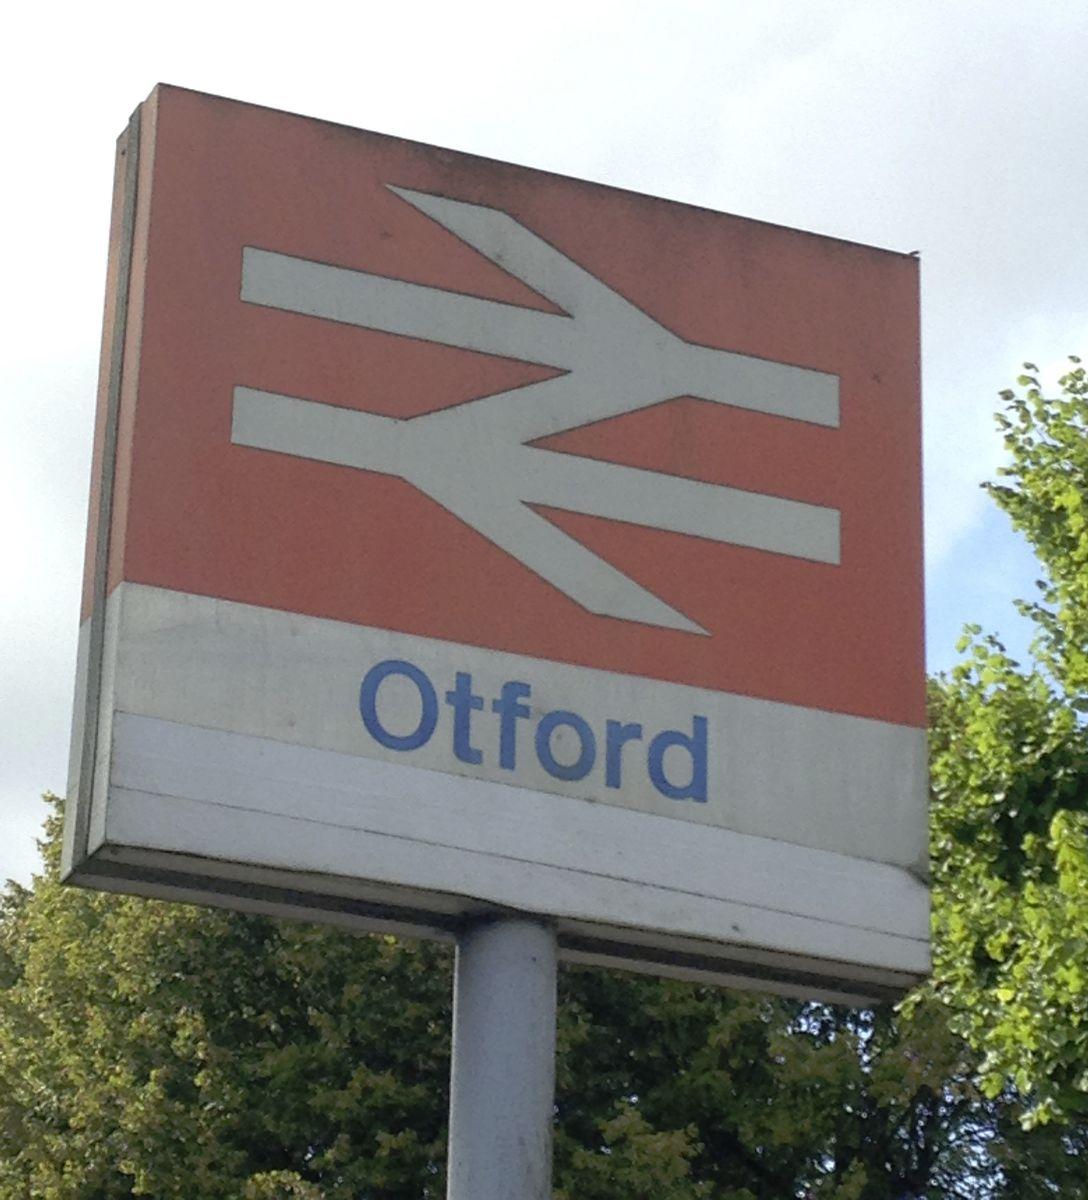 Standard British UK Rail sign outside my home station.